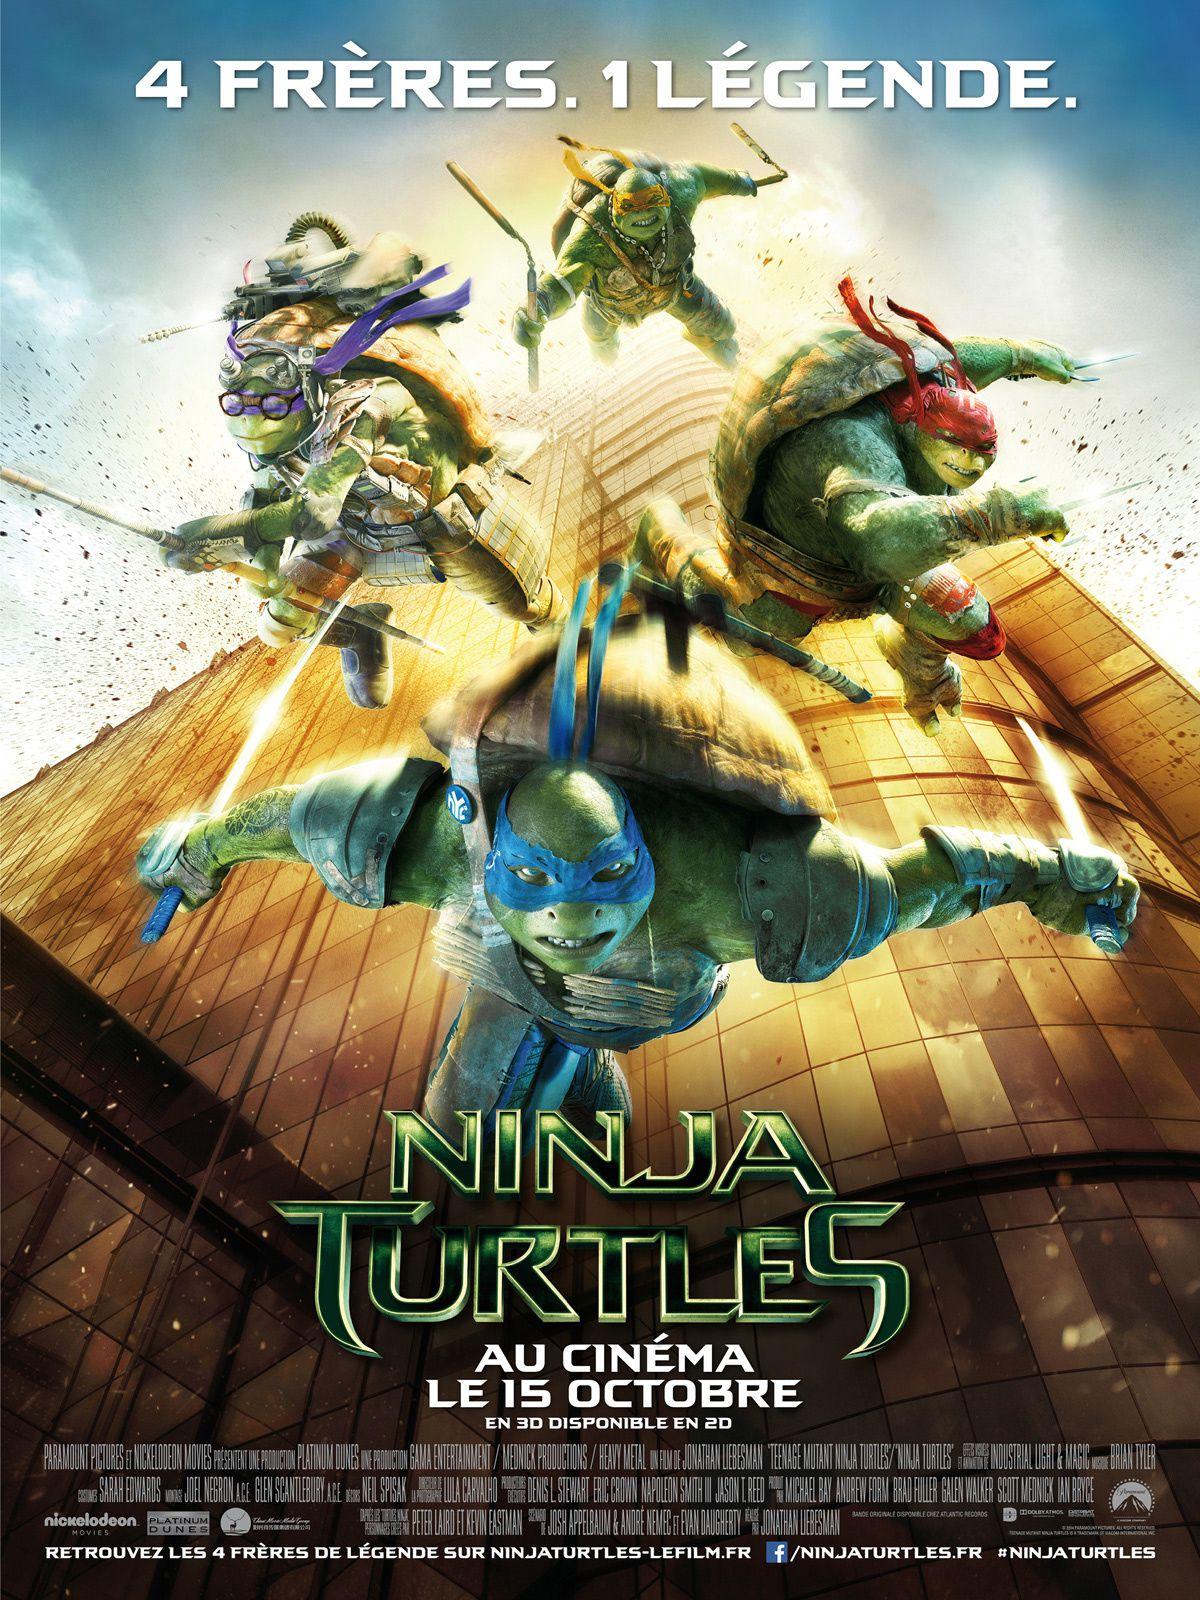 [Review] Ninja Turtles